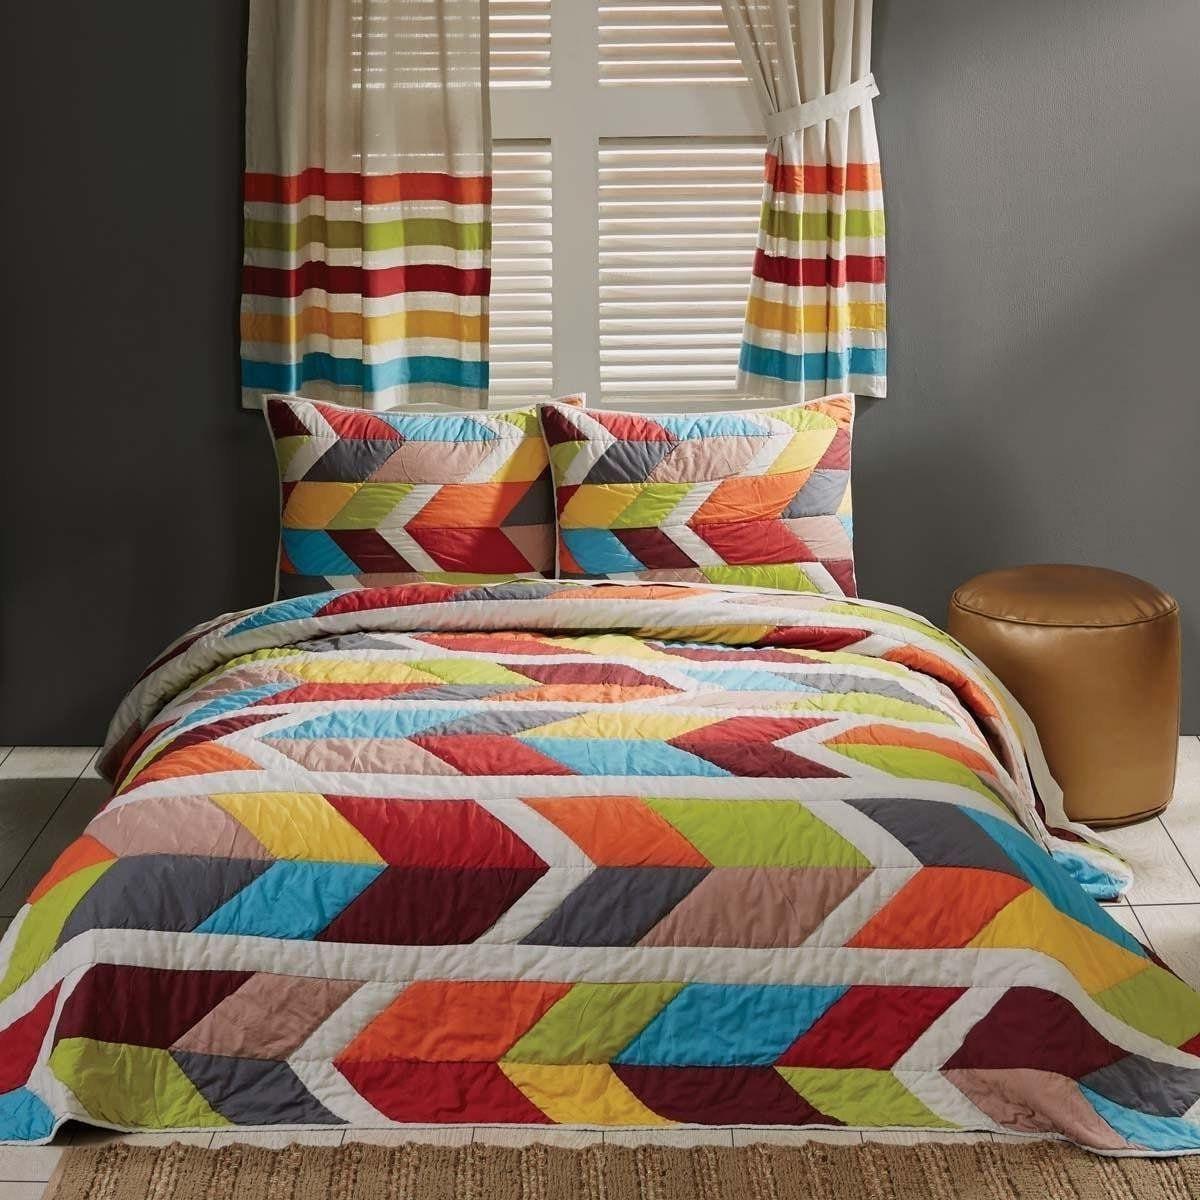 Duvet Cover /& Pillowcase Set 100/% Cotton Marrakesh White//Teal//Orange